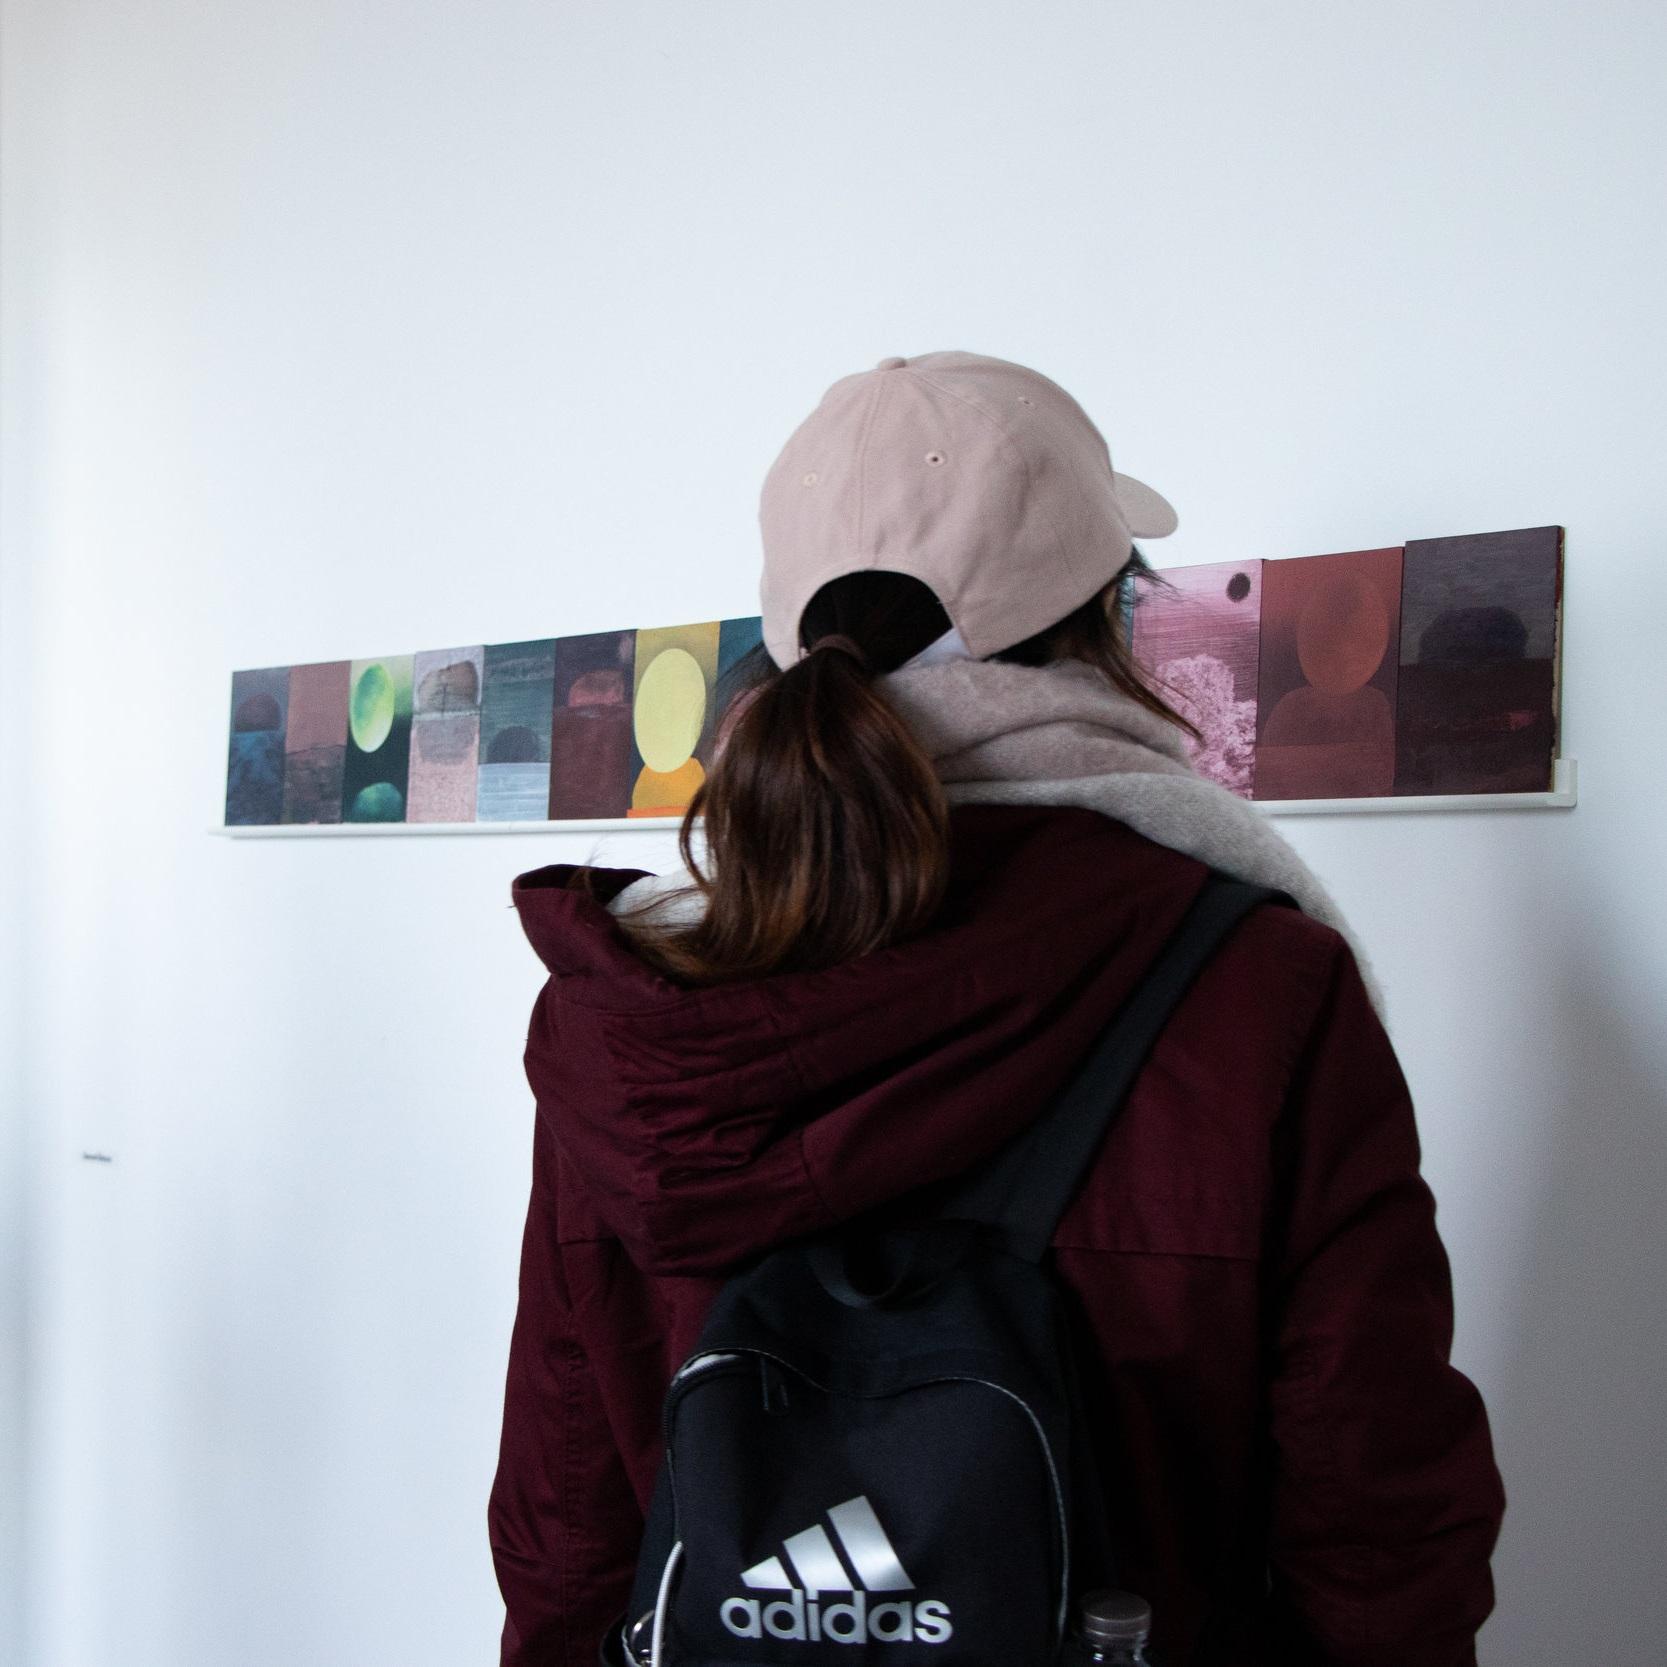 A visitor views Samuel Âhlman's work at Backlit, Nottingham. Photo by Mel Malkin.